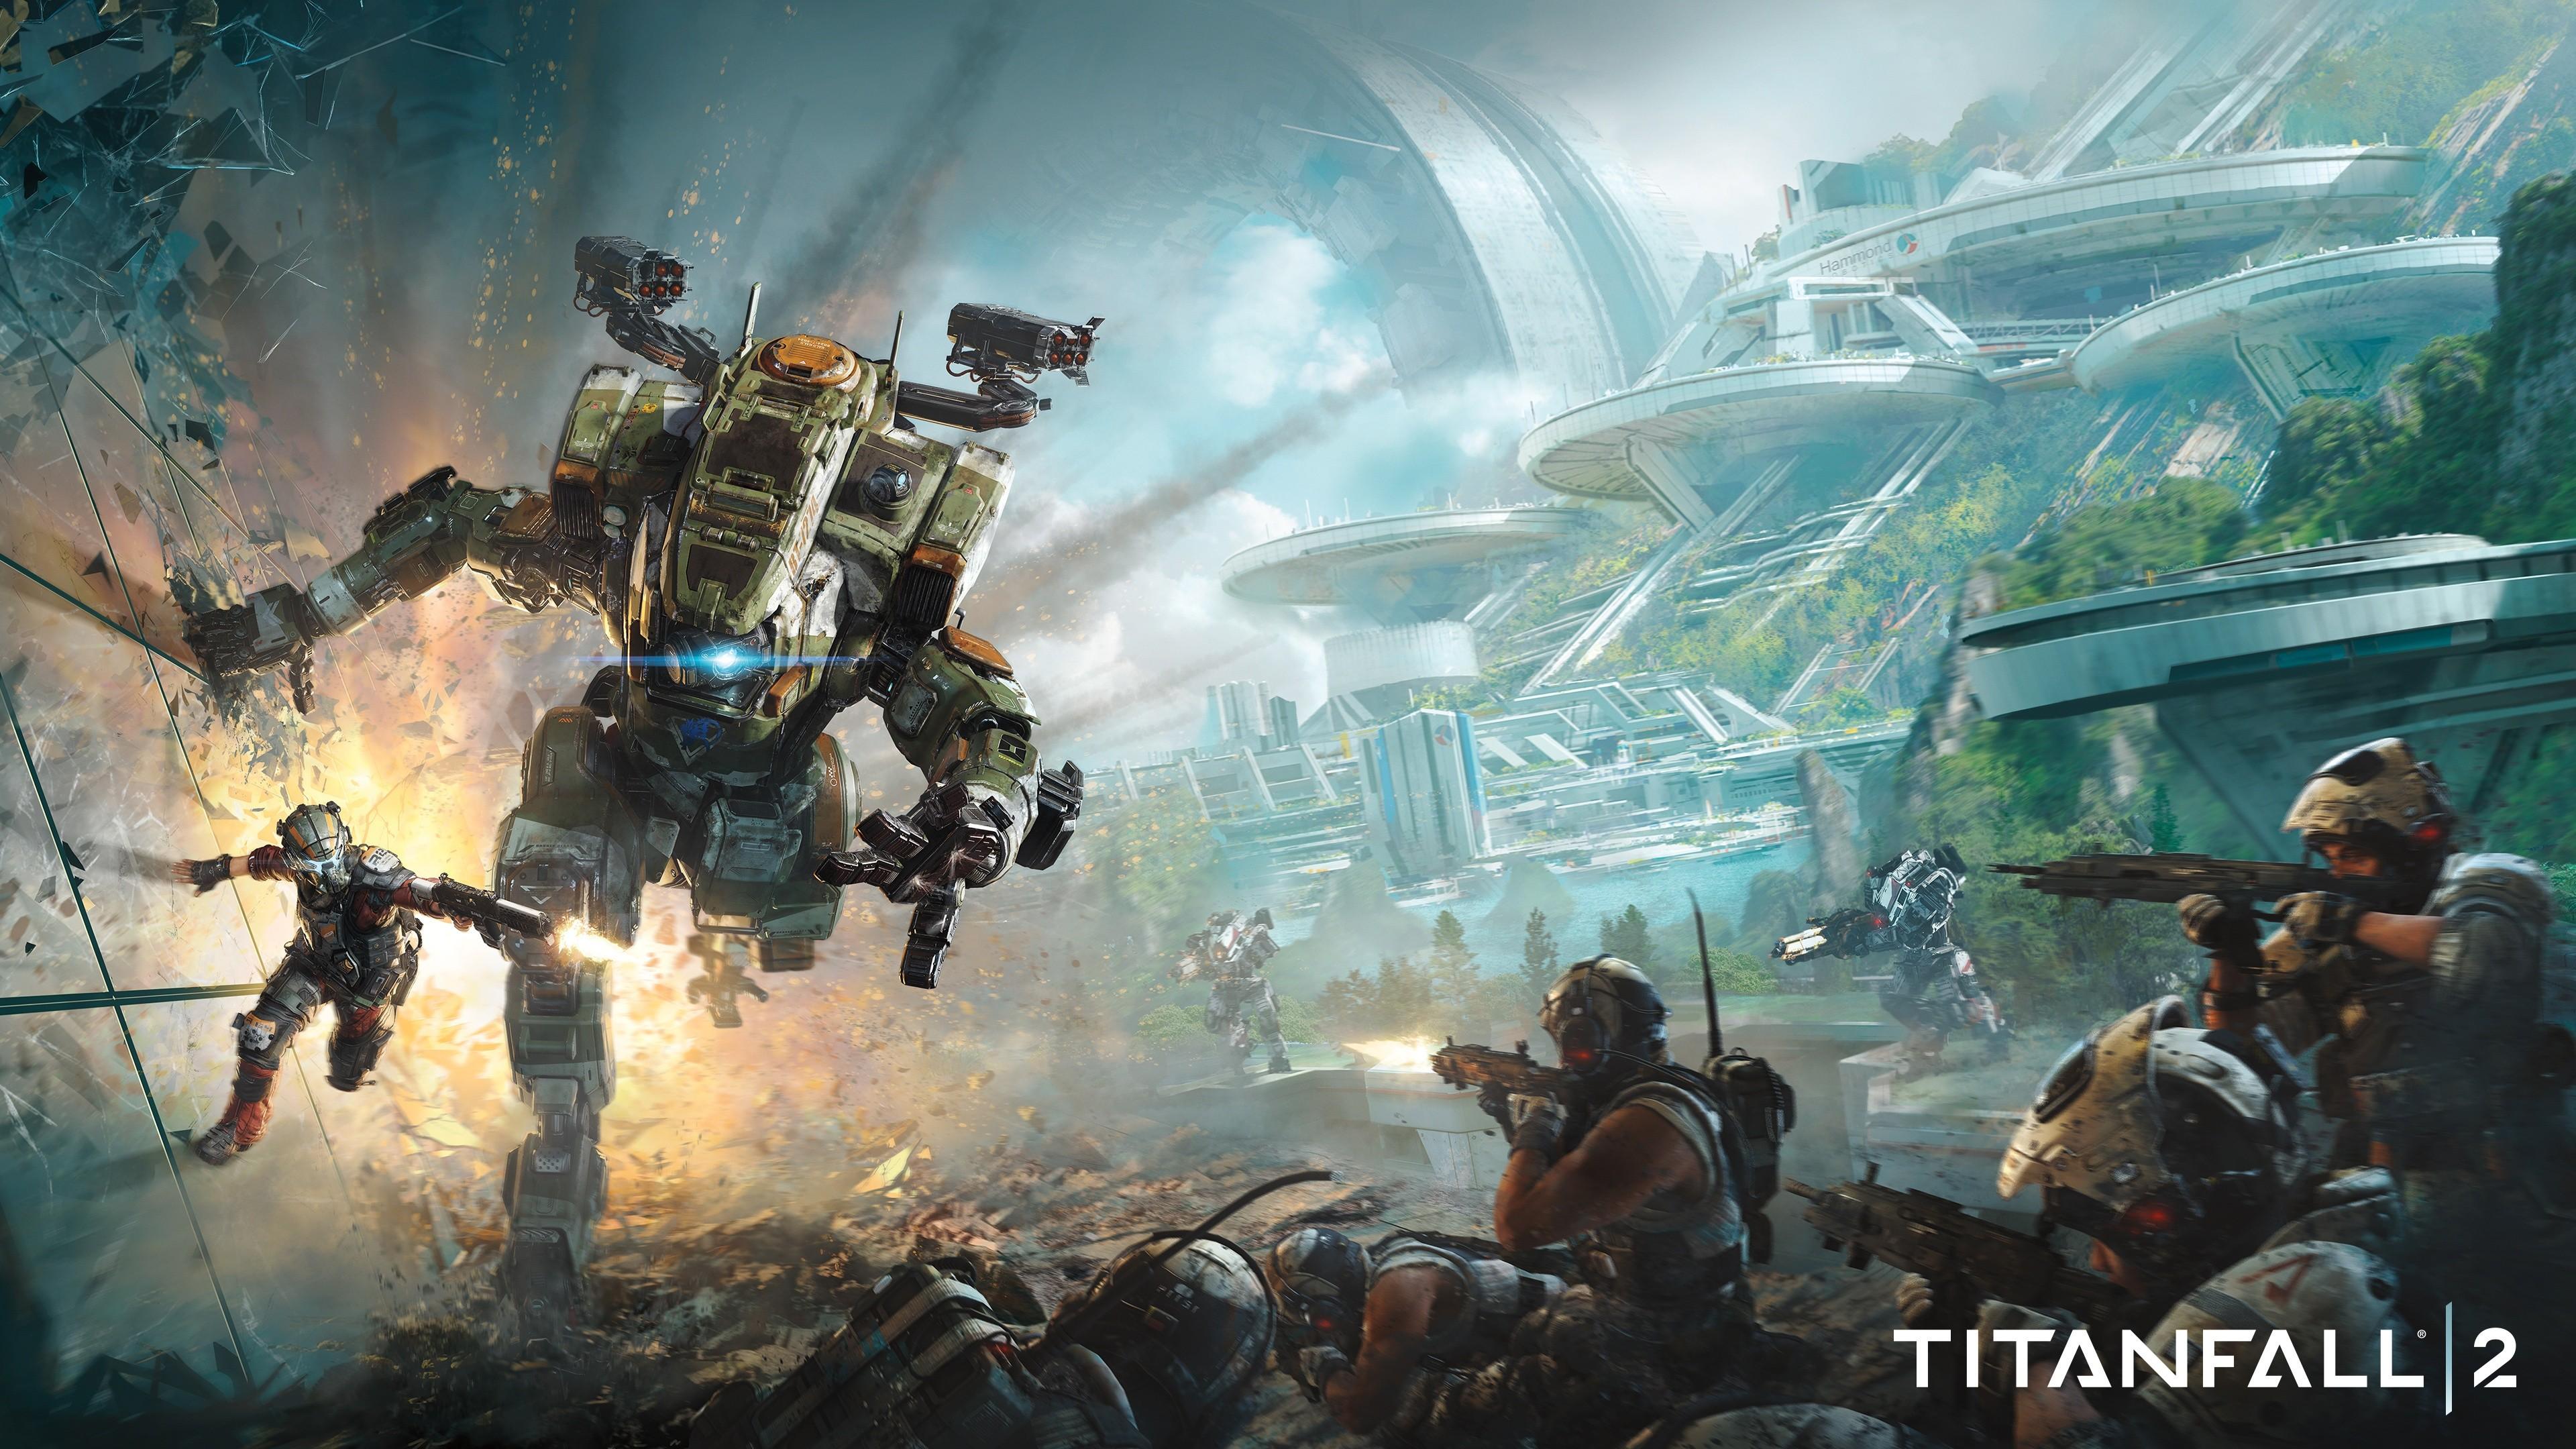 Architecture Wallpaper Fall Wallpaper Titanfall 2 E3 2016 Shooter Best Games